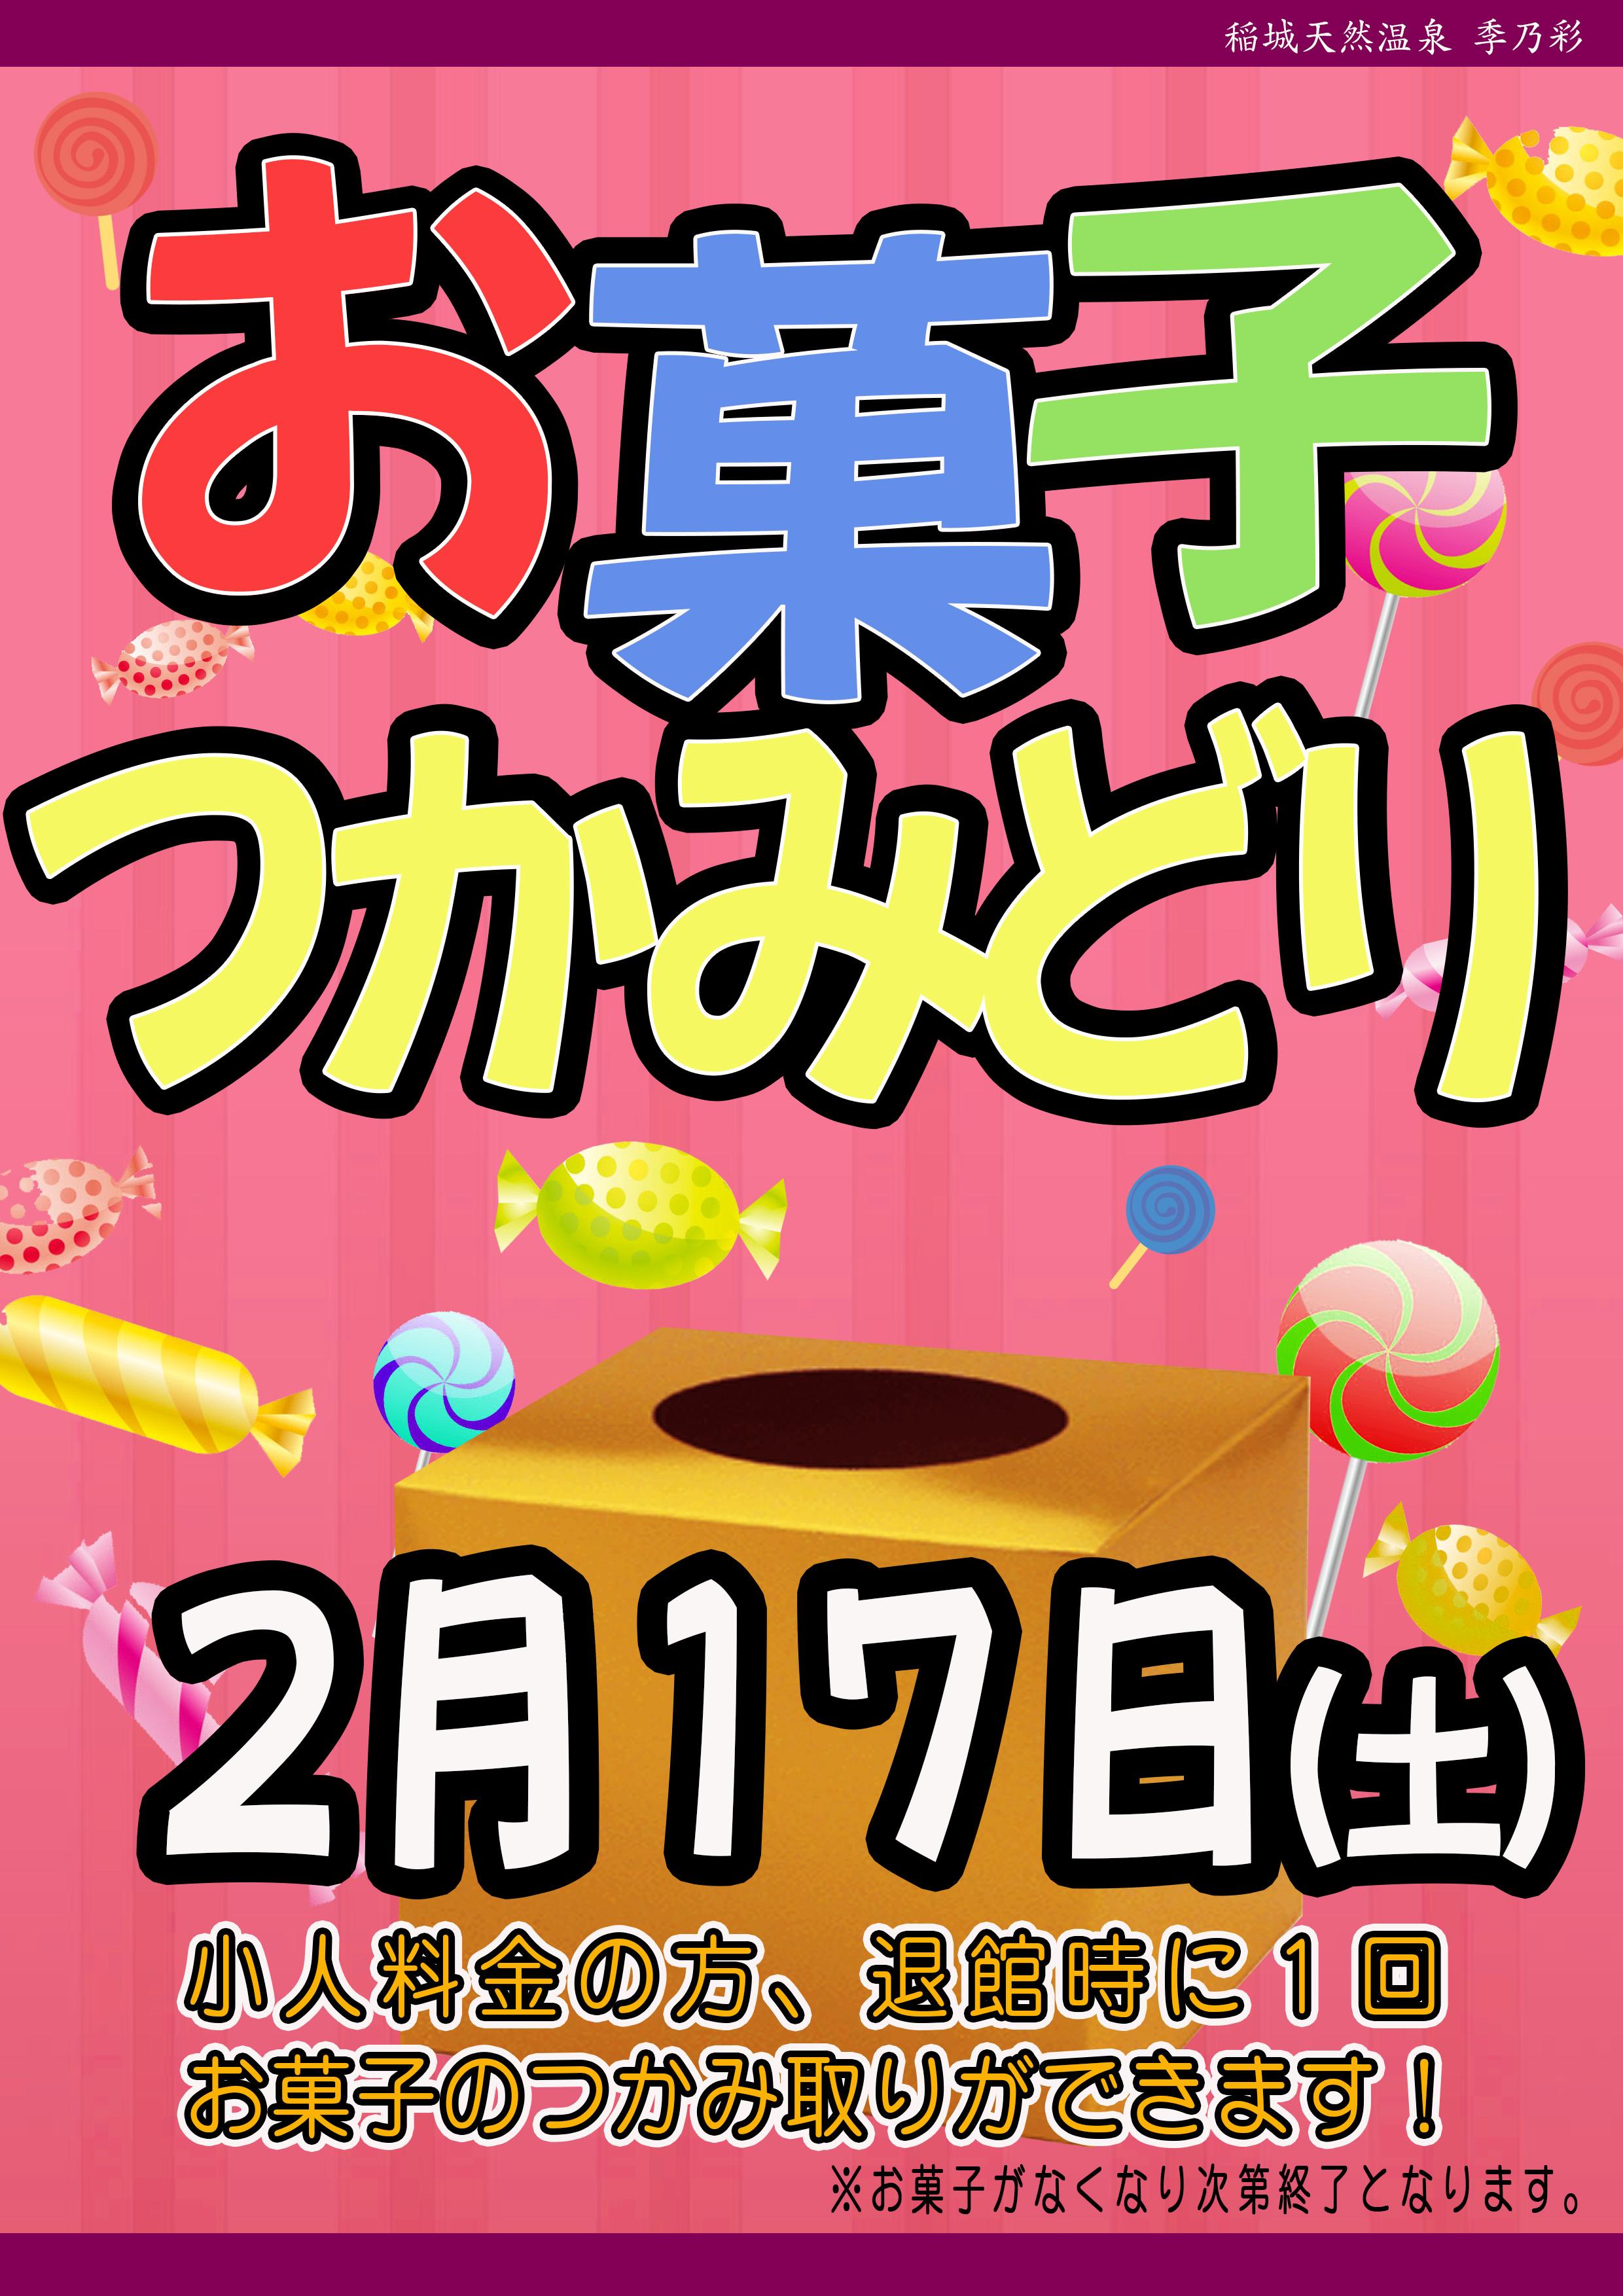 20180217POP イベント お菓子つかみ取り 赤系